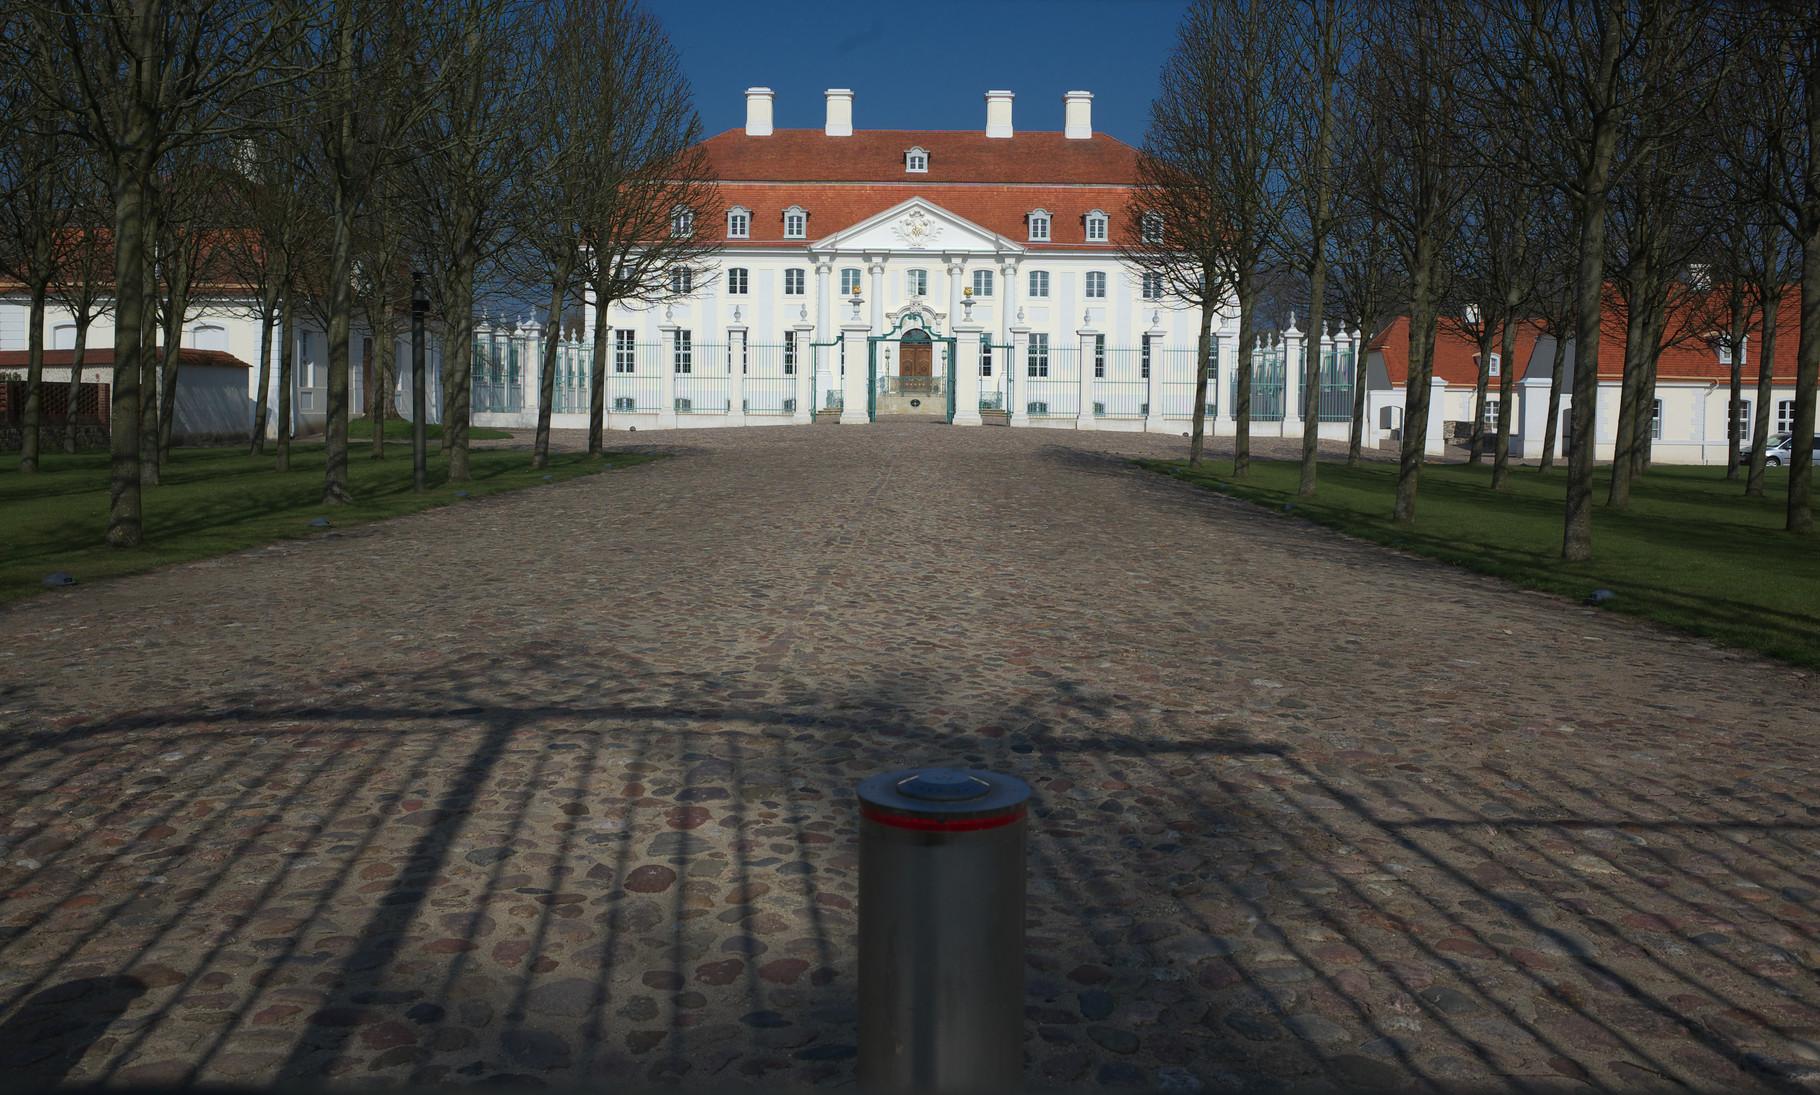 Schloss Meseberg - Gästehaus der Bundesregierung am 09.04.2016